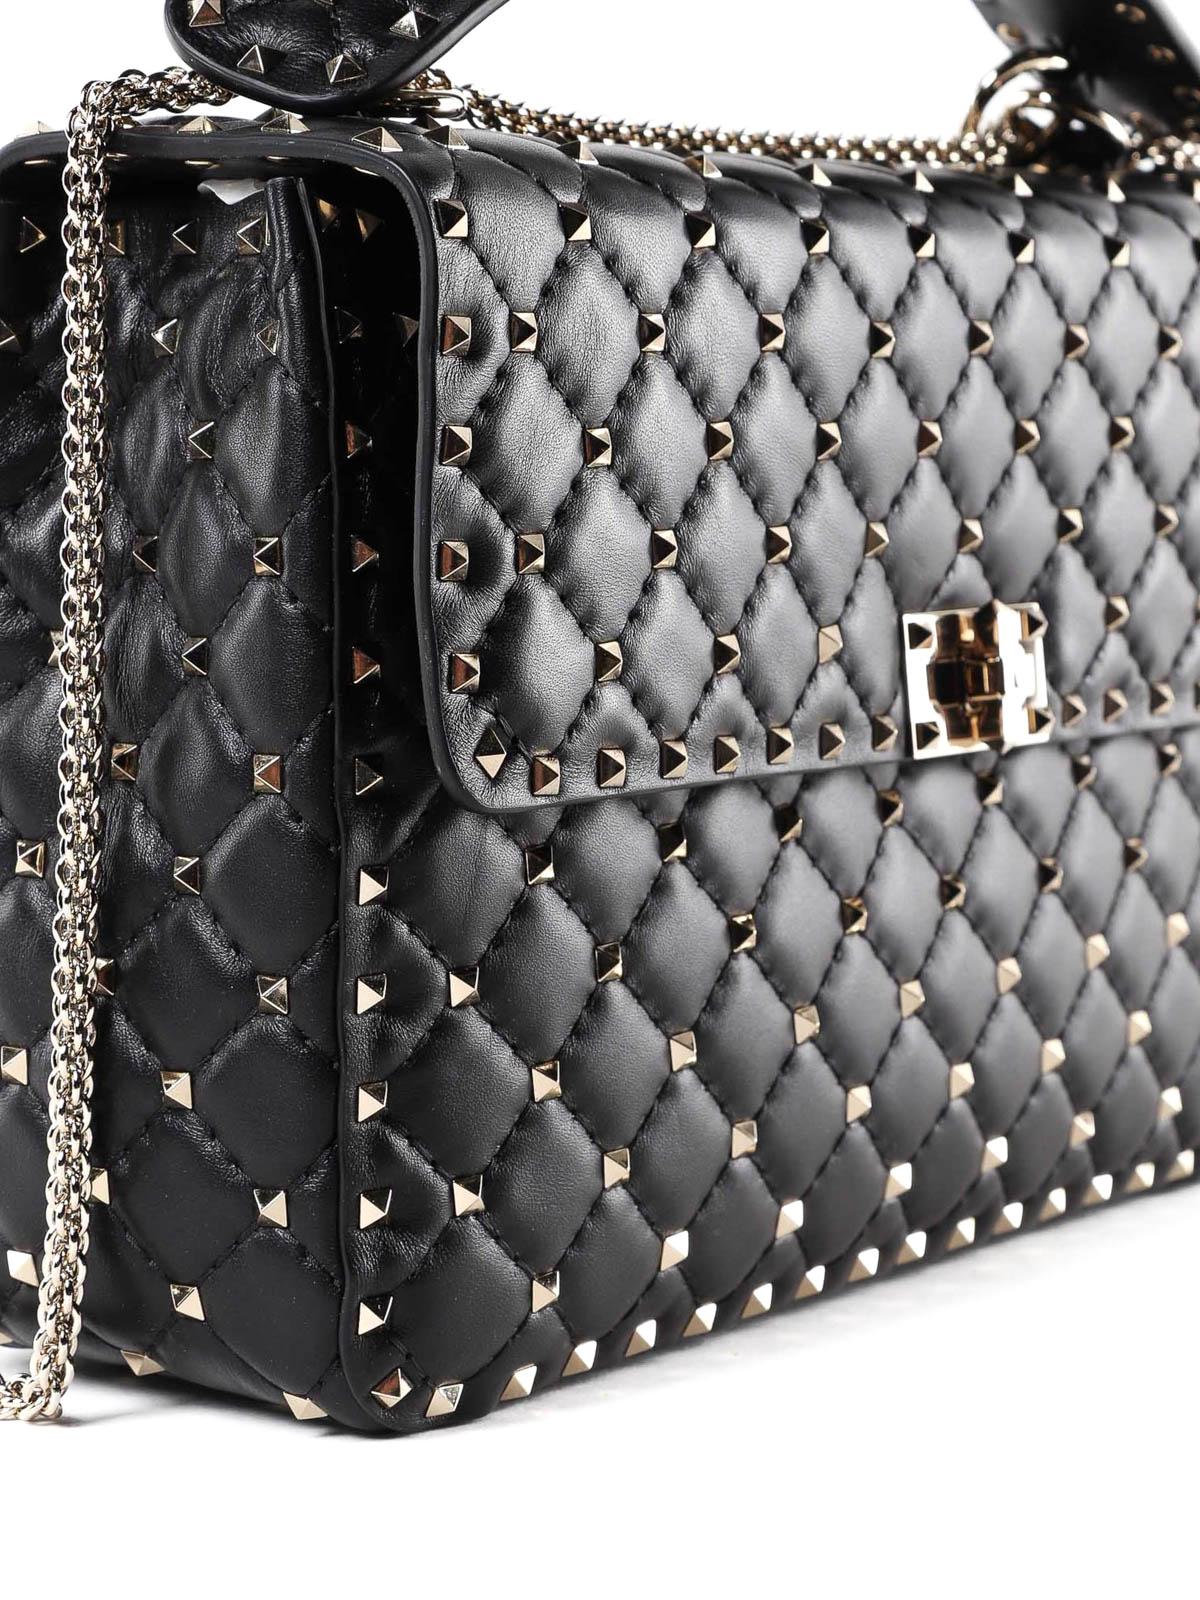 6cd16110e5b5 Rockstud Spike large black lambskin bag shop online  VALENTINO GARAVANI